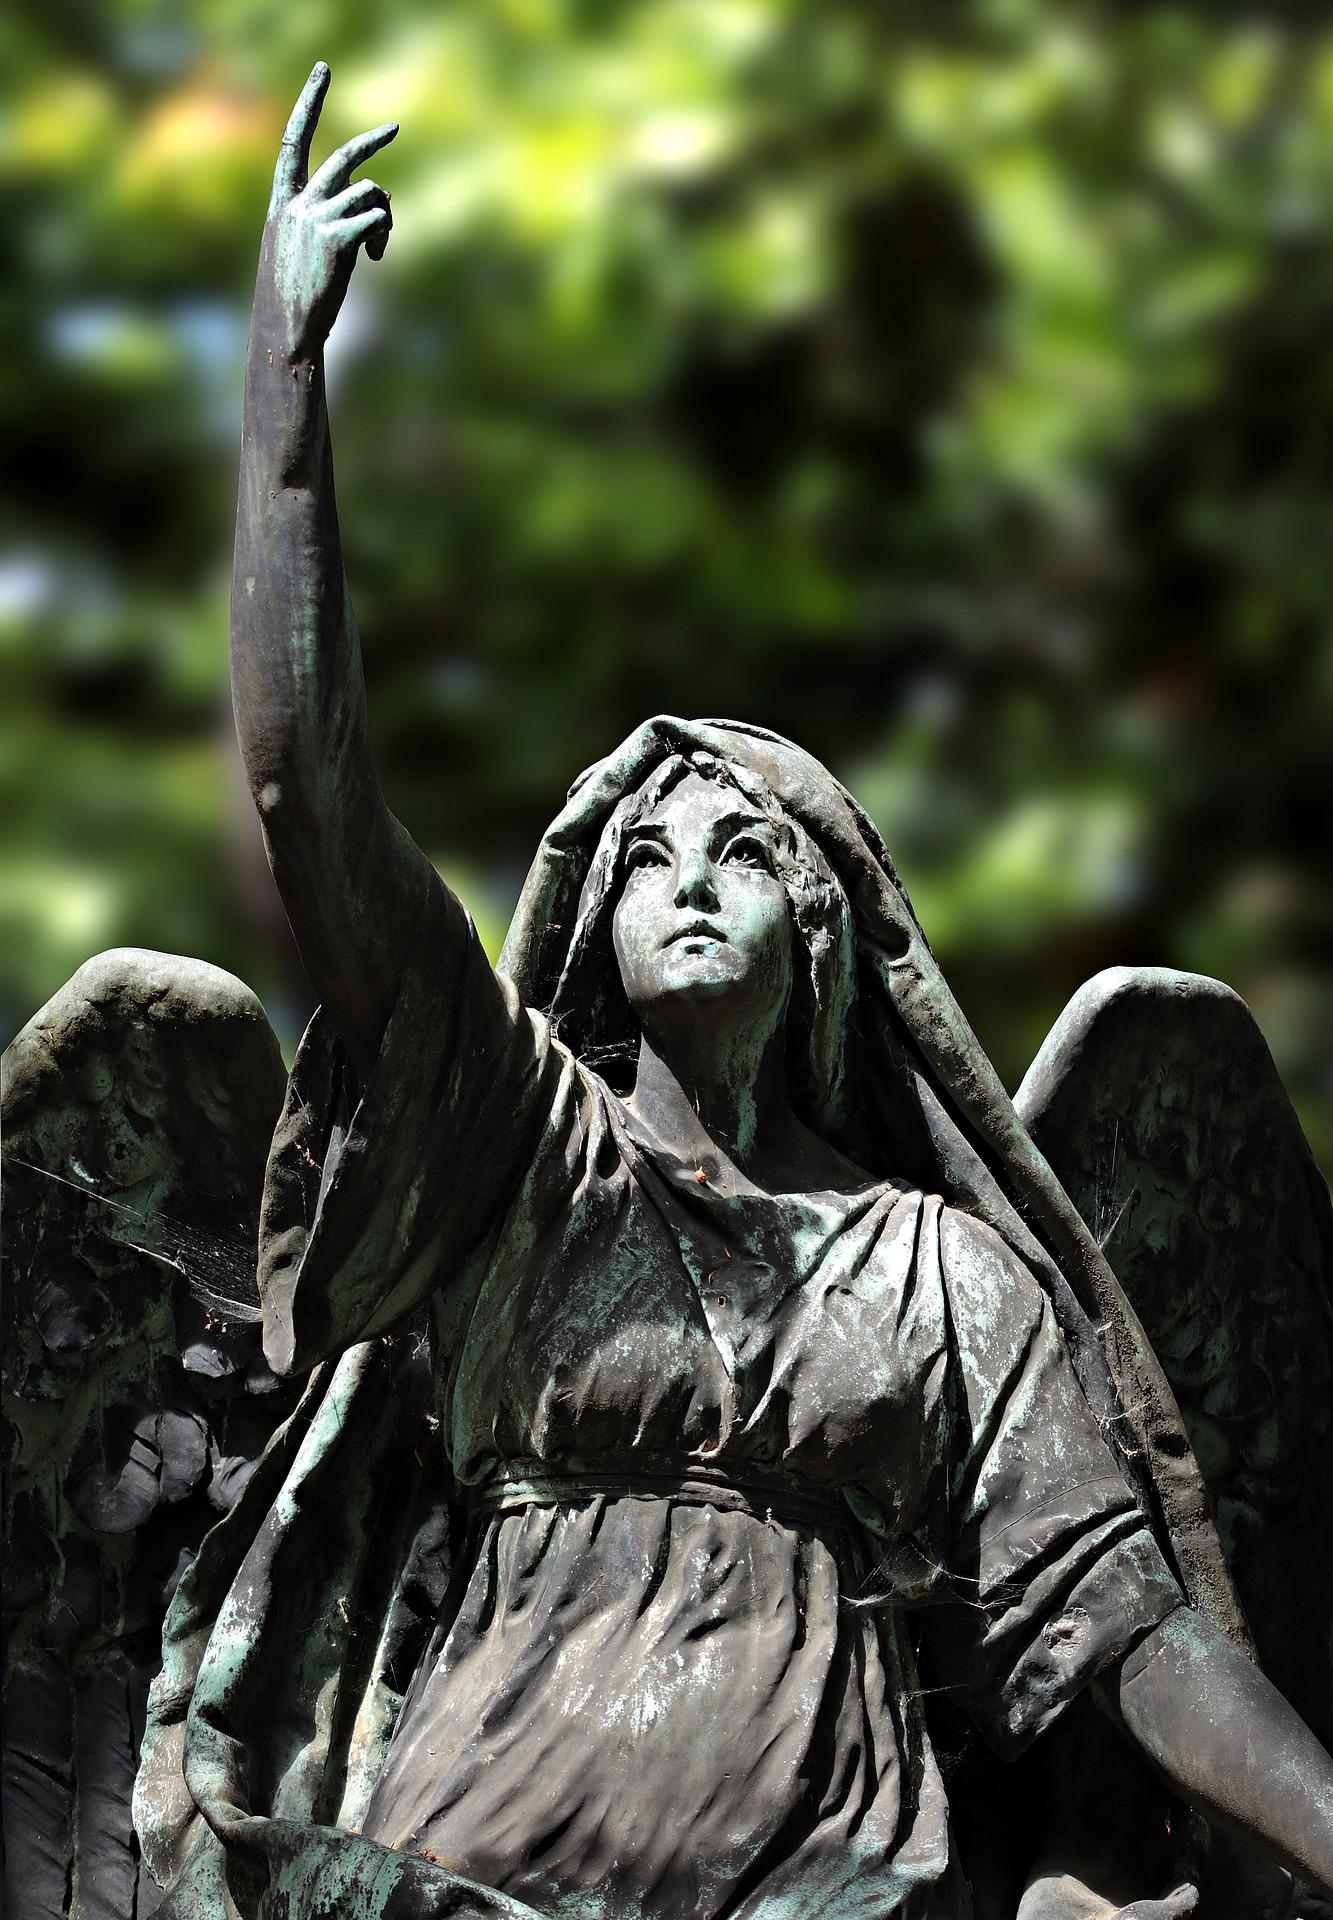 angel-2401263_1920.jpg